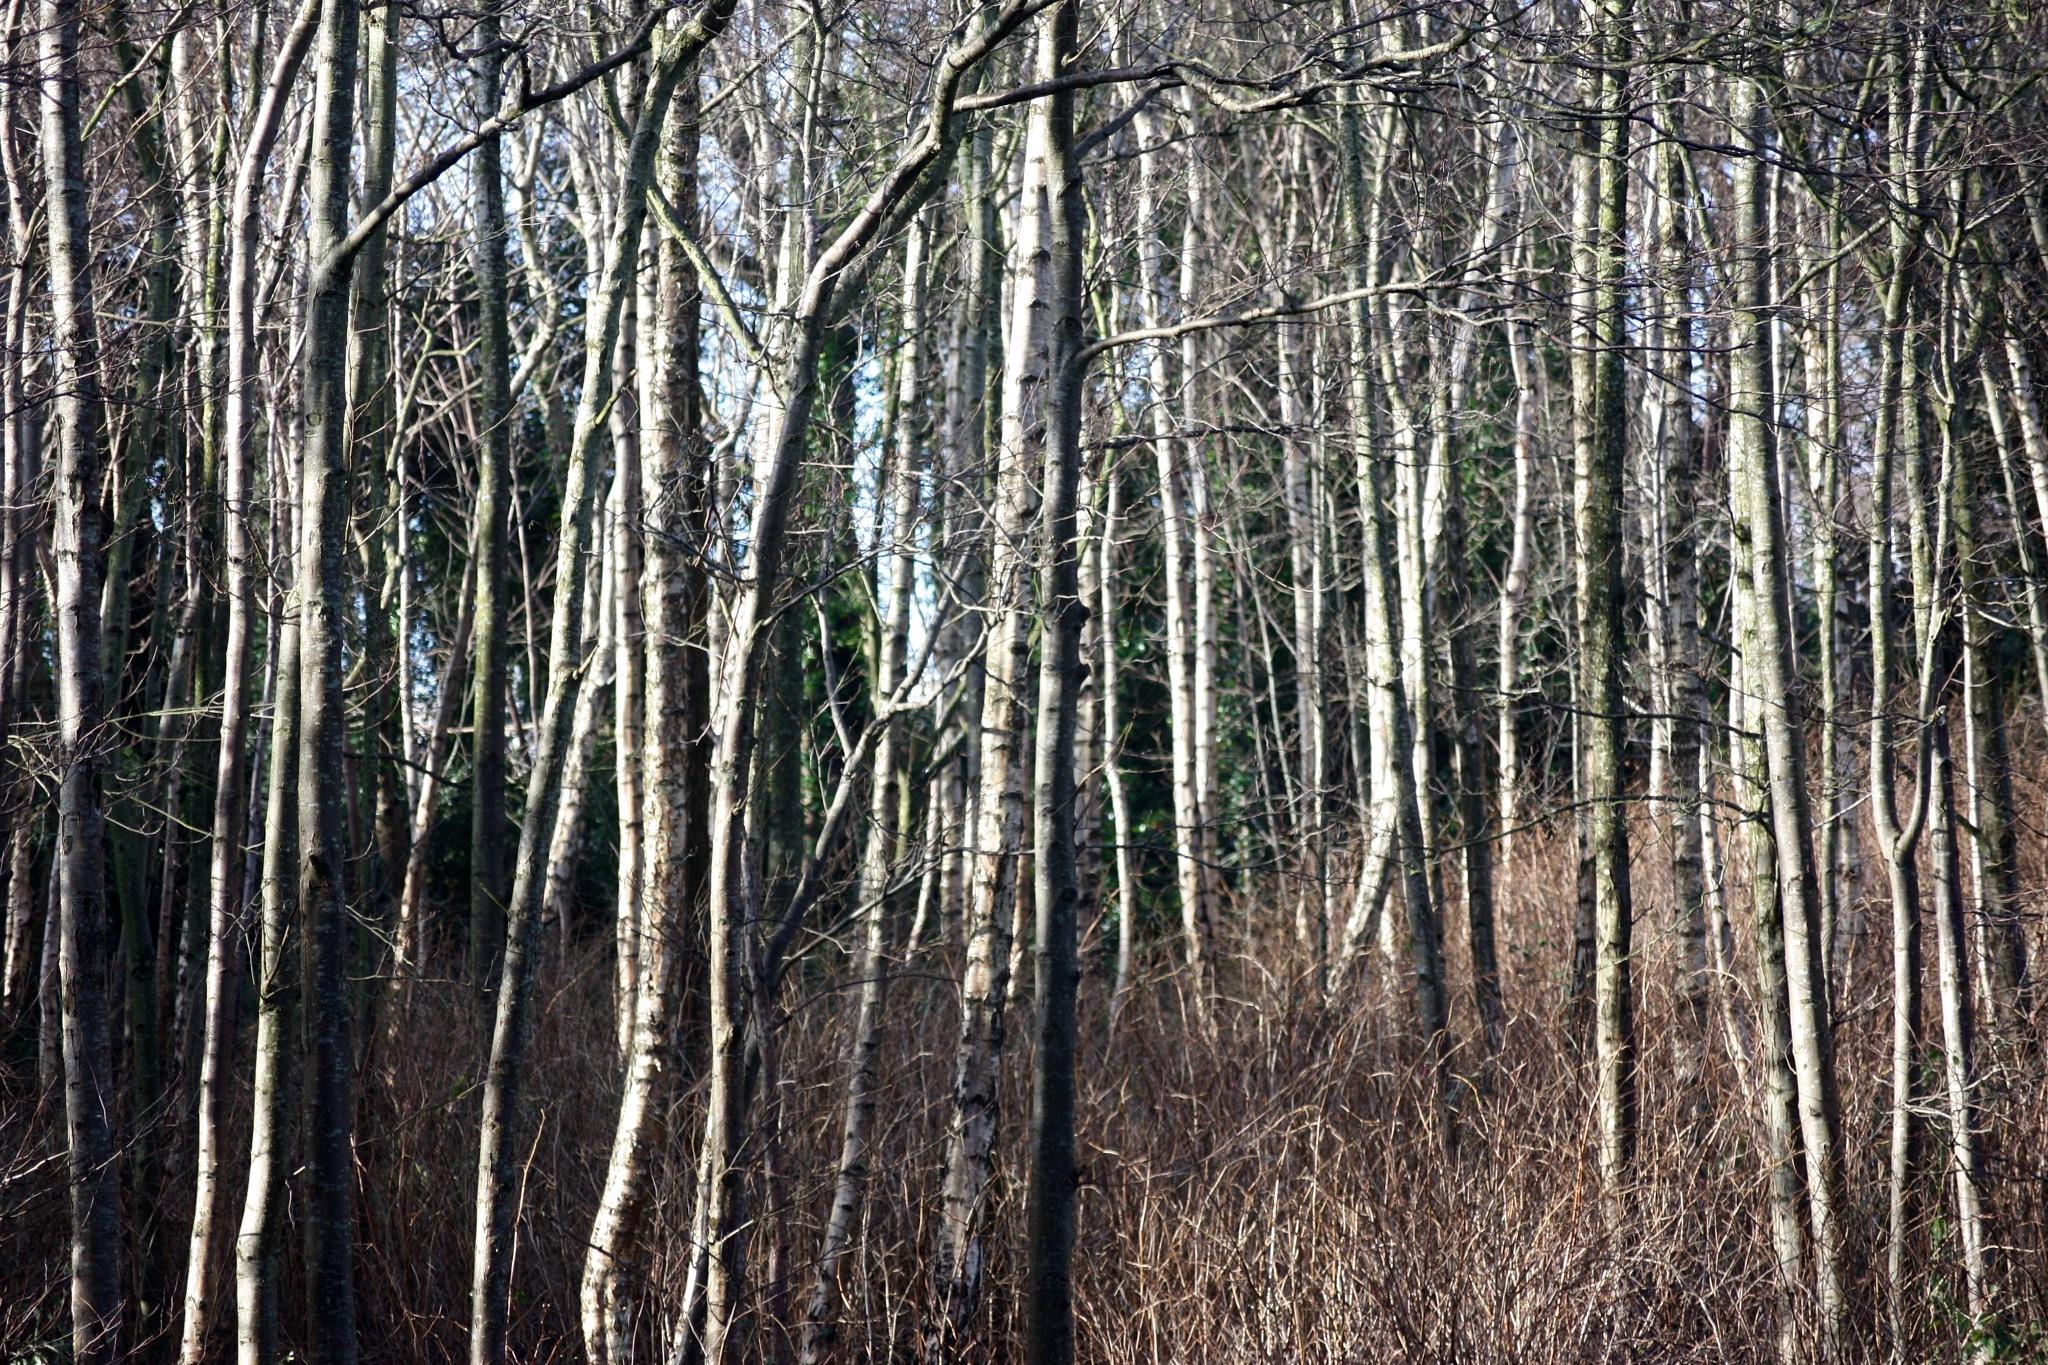 Winter trees # 1. by Geoff.McElwaine